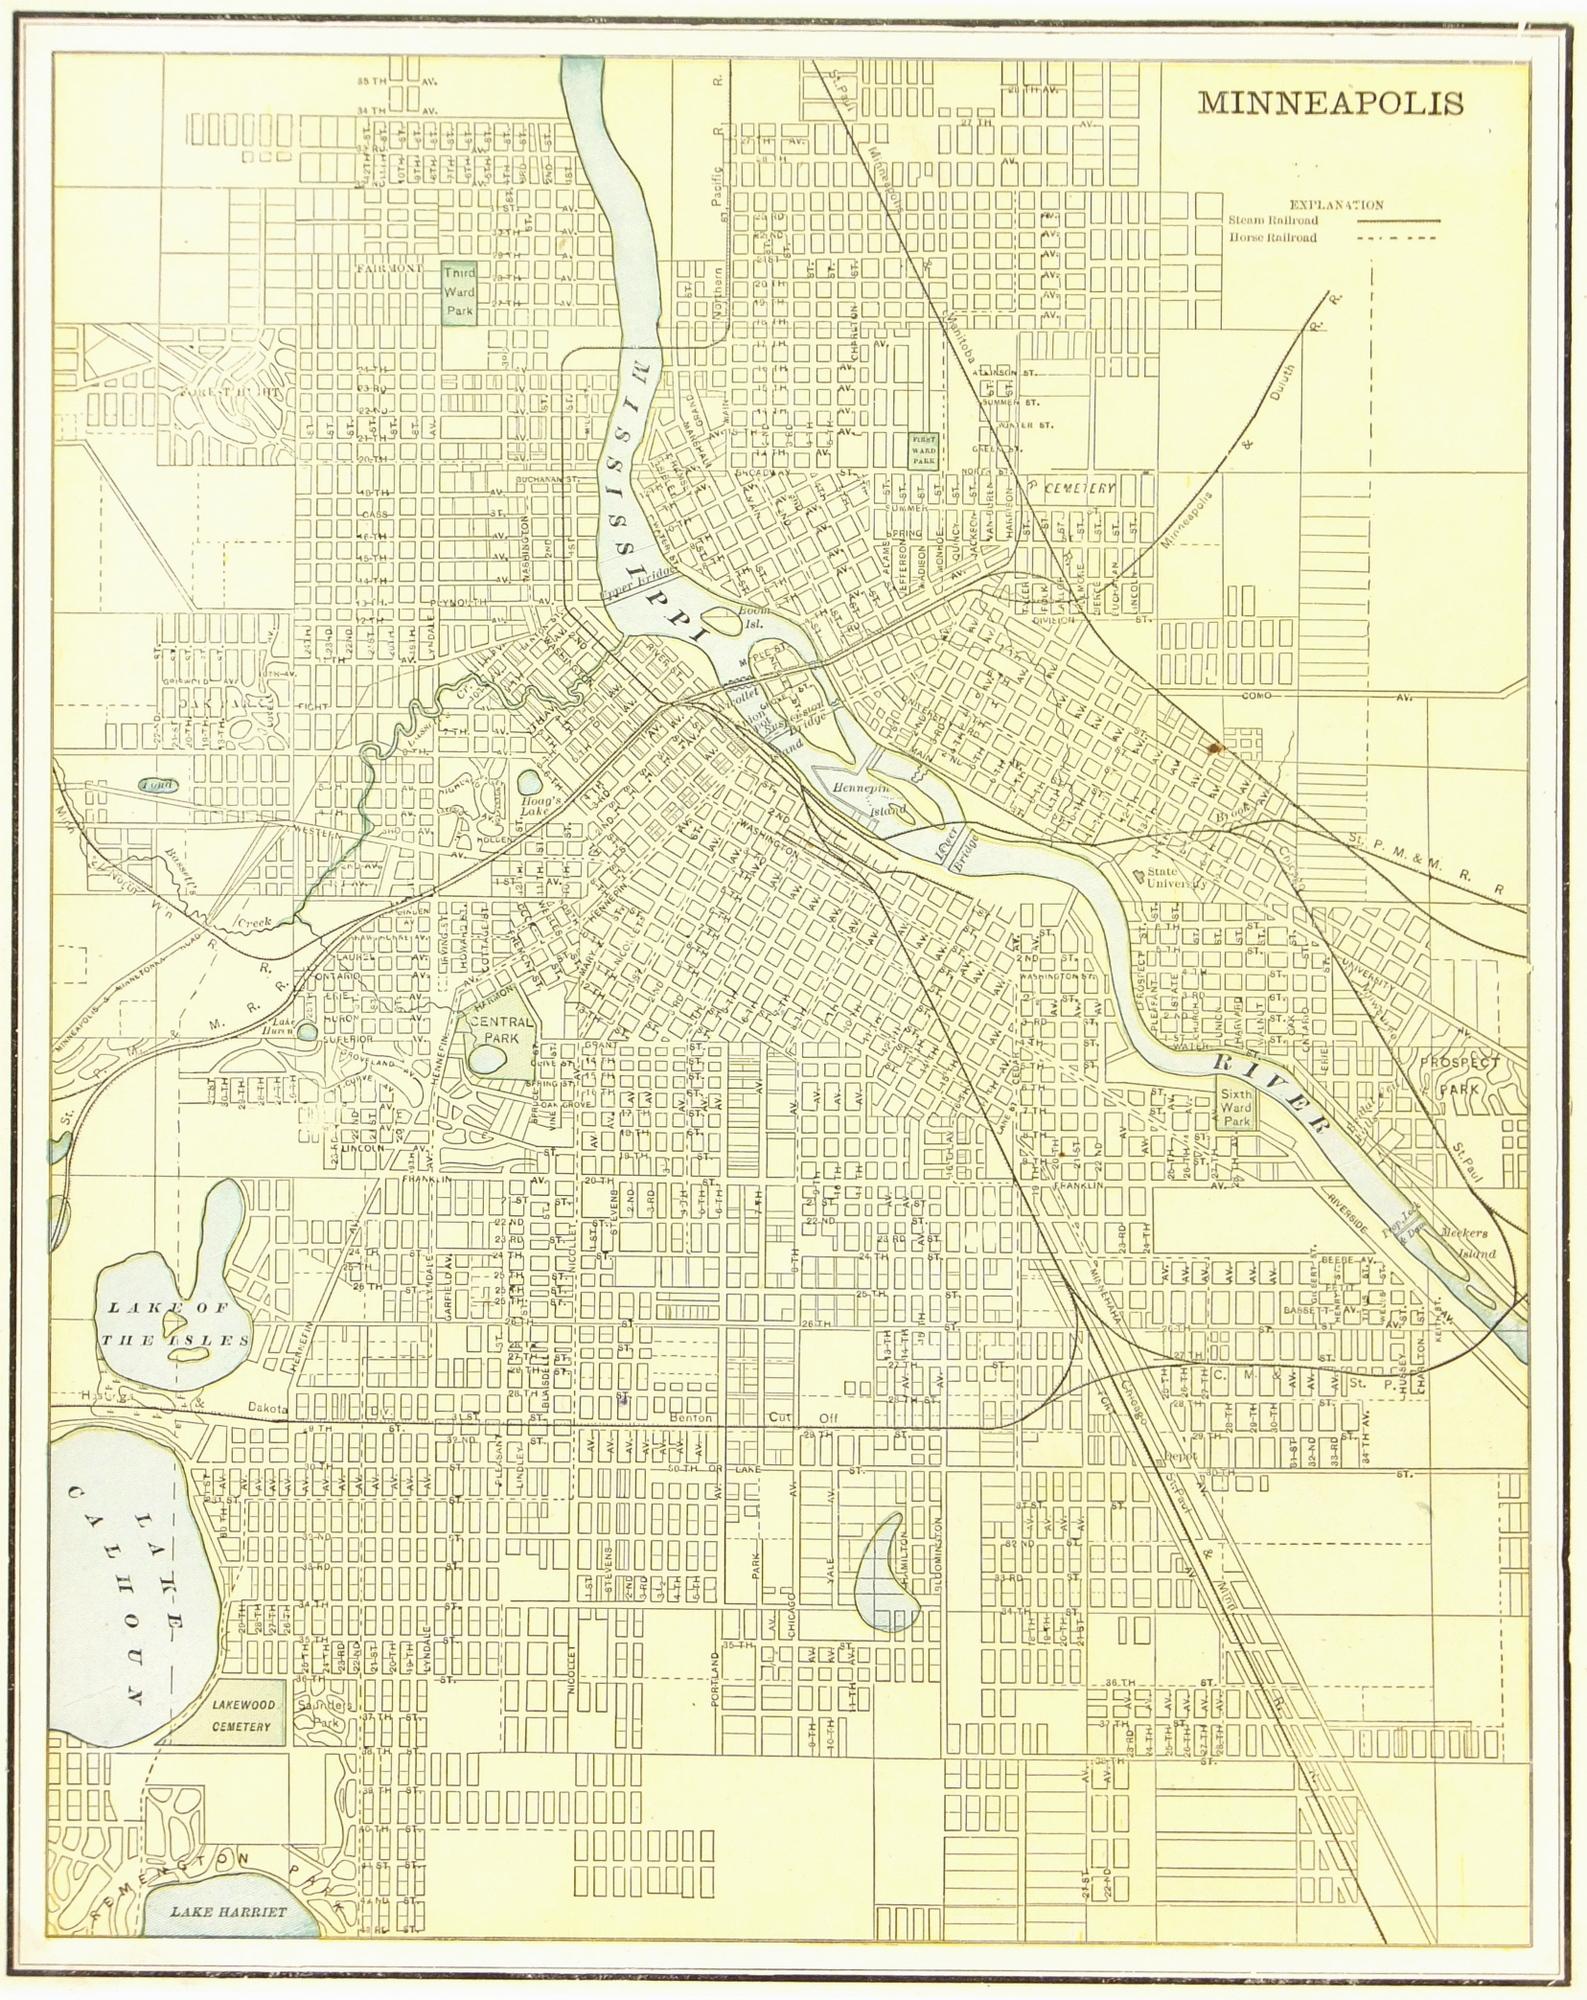 Minneapolis, 1889-main-7647K